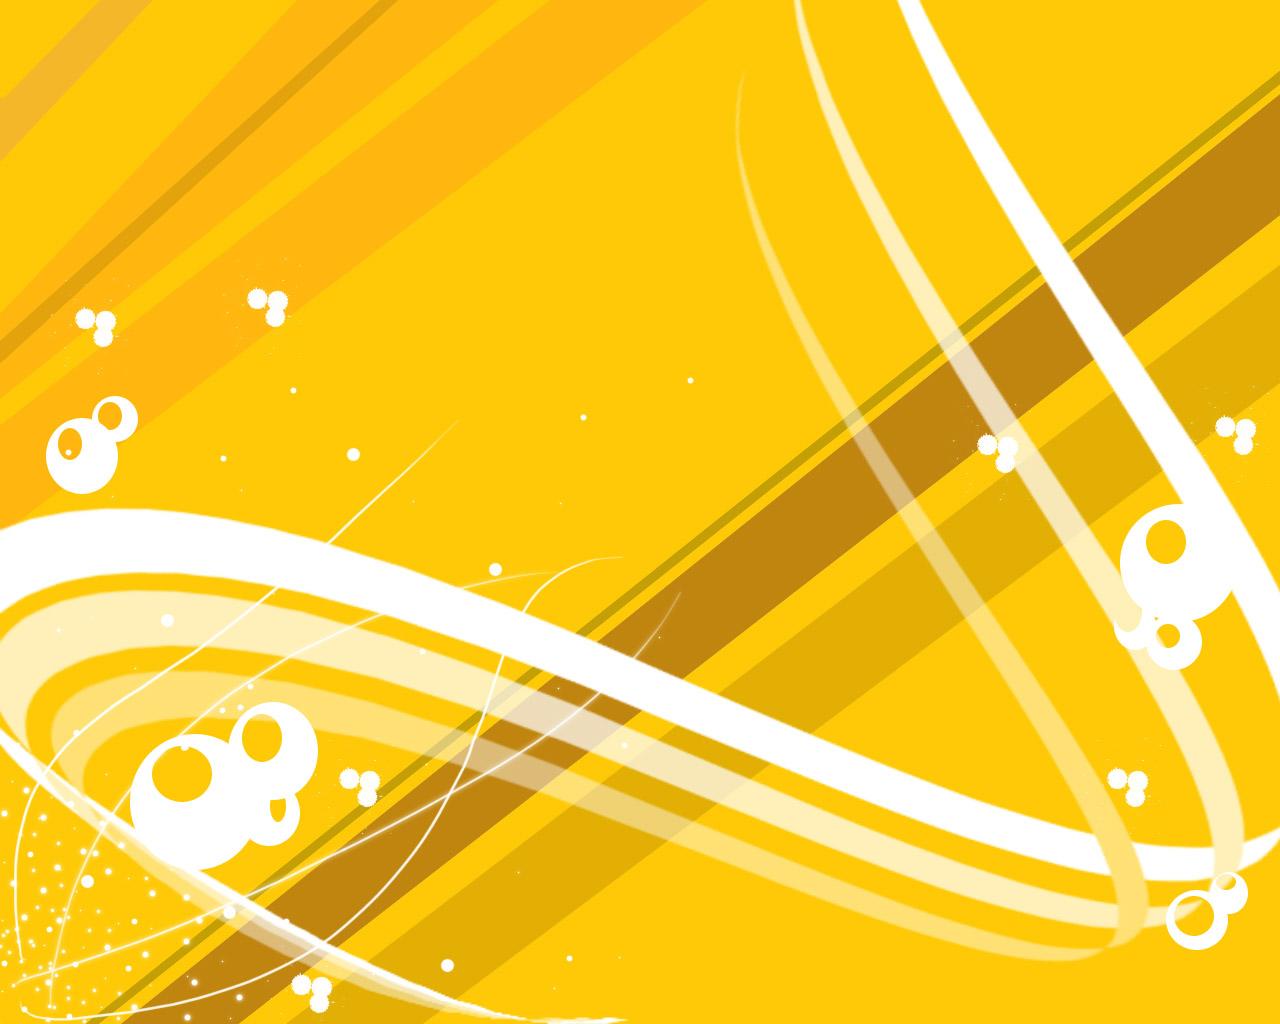 Hd Motorcycle Wallpaper Widescreen Yellow Wallpapers Yellow Wallpapers